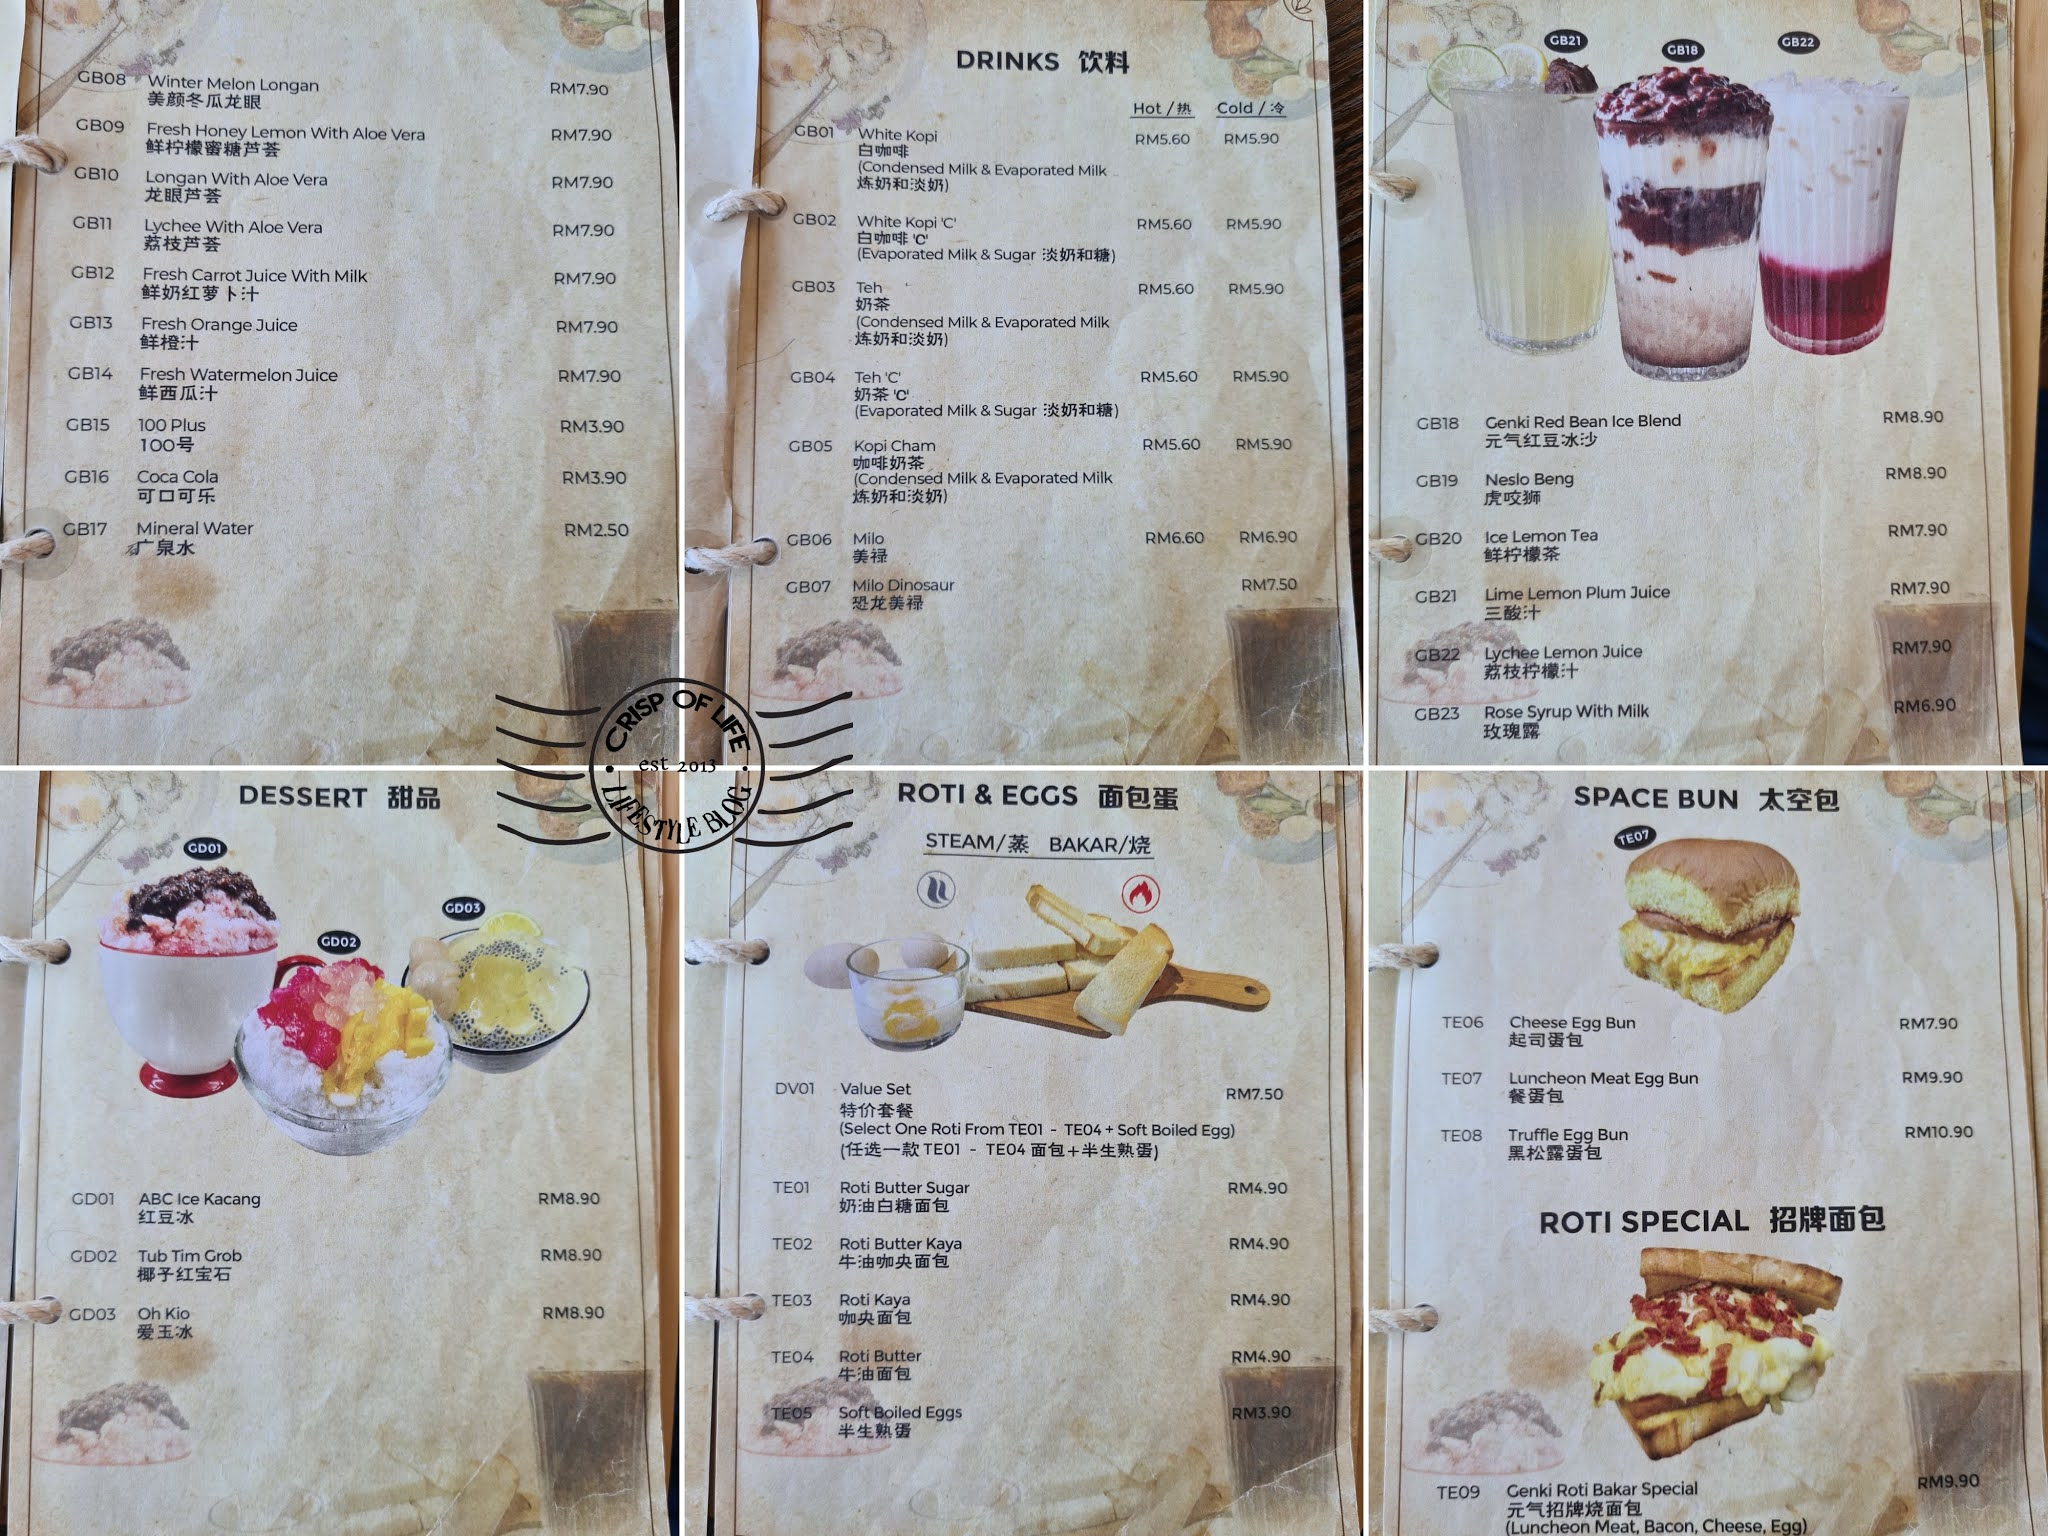 Genki Canteen 元气食堂 - A Premium Local Penang Hawker Food Cafe